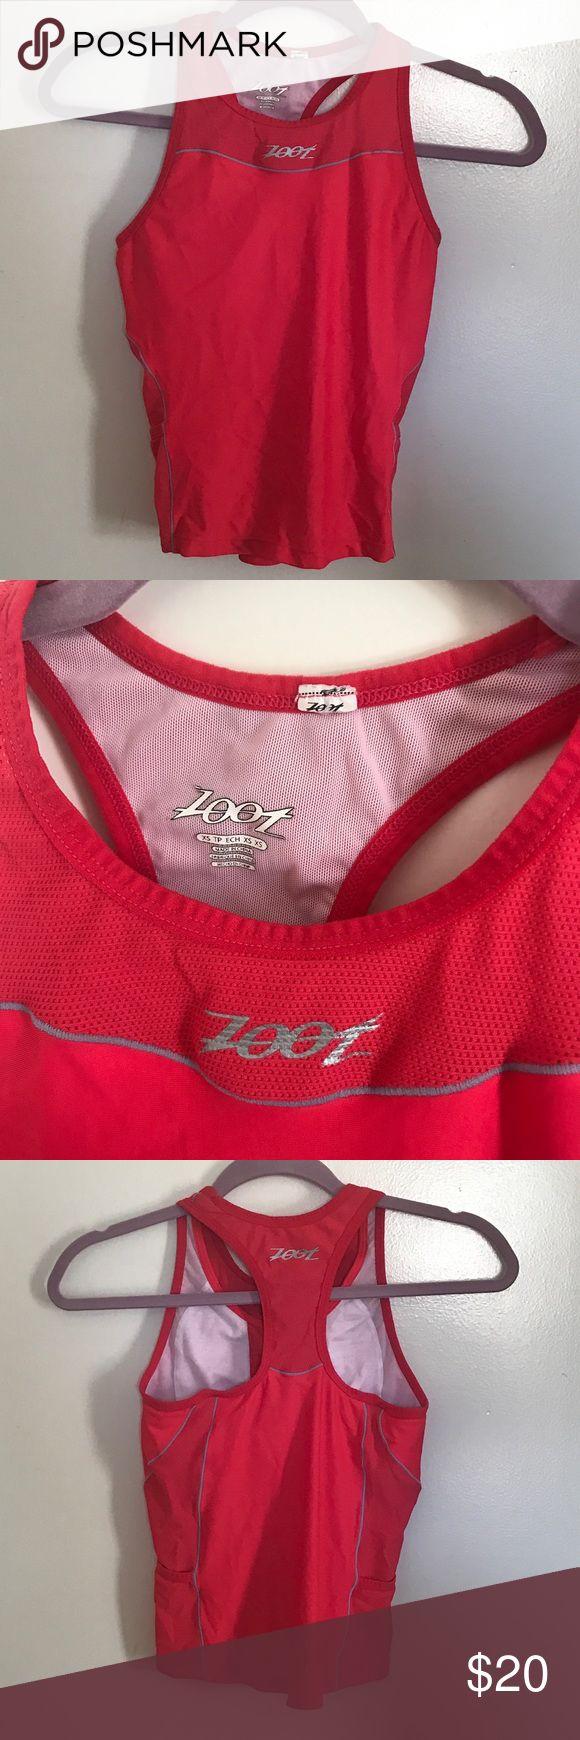 Zoot Triathlon Tank Top Size XS Great condition. Smoke free, pet friendly home. Zoot Tops Tank Tops